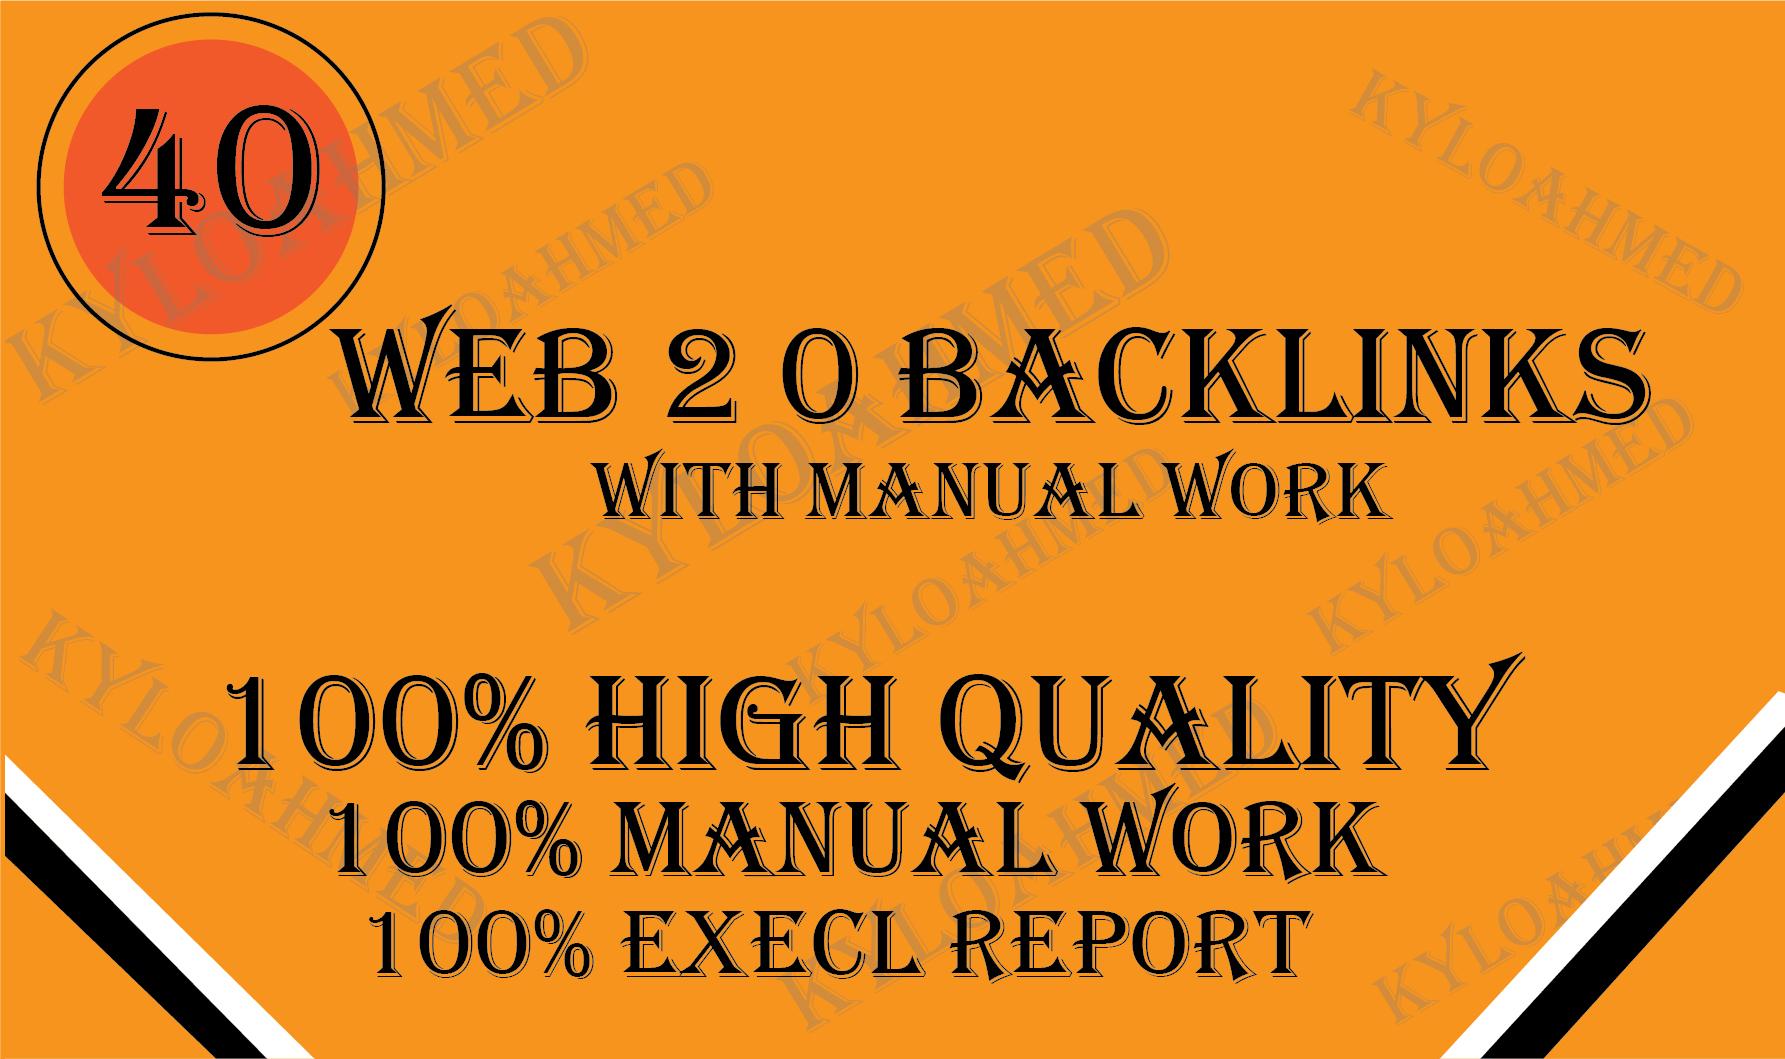 I will build 20 manually web 2.0 backlinks and high quality backlinks